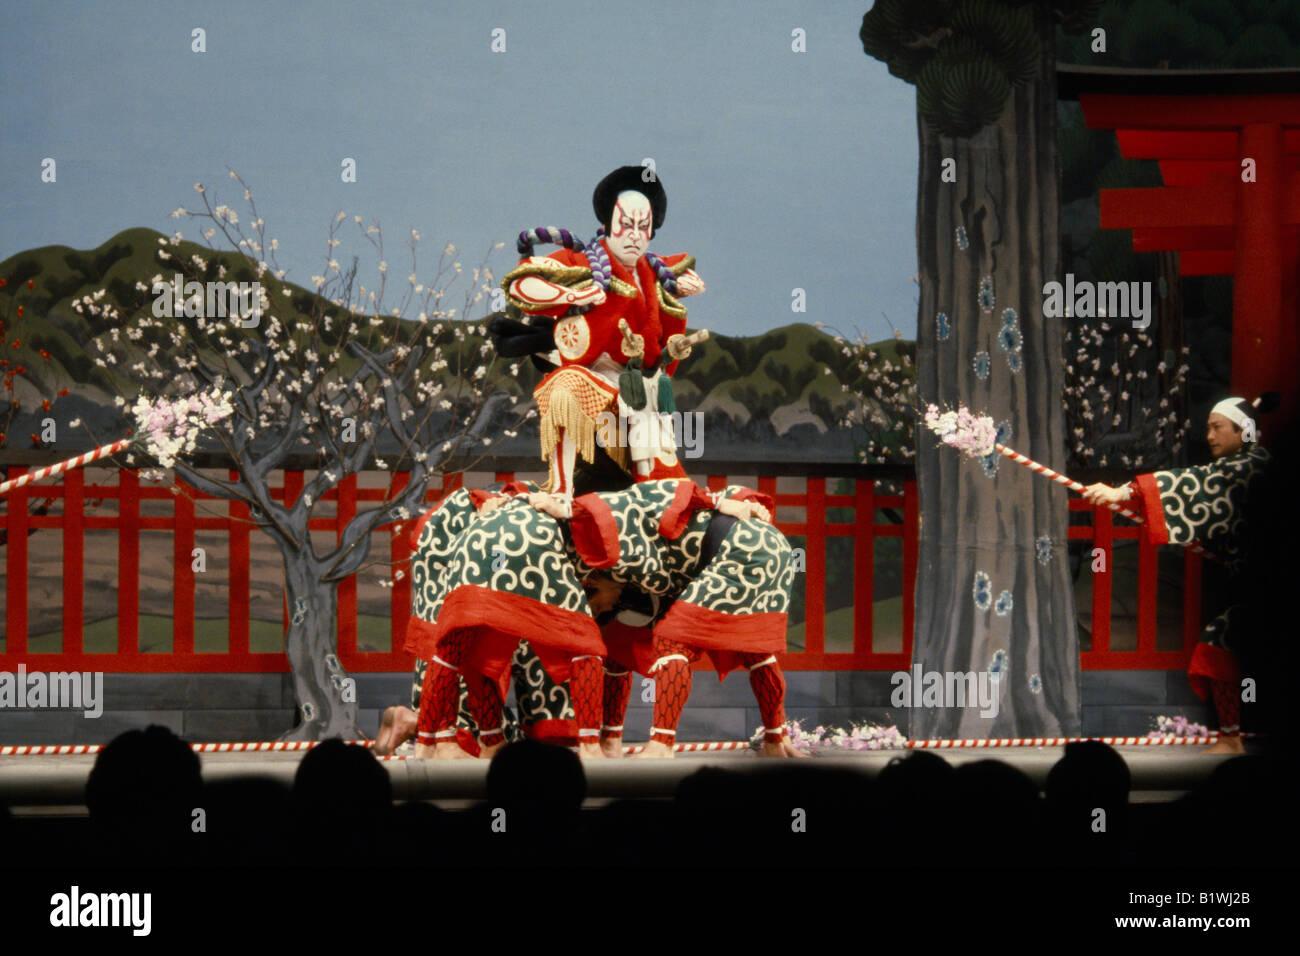 JAPAN Arts Performance - Stock Image